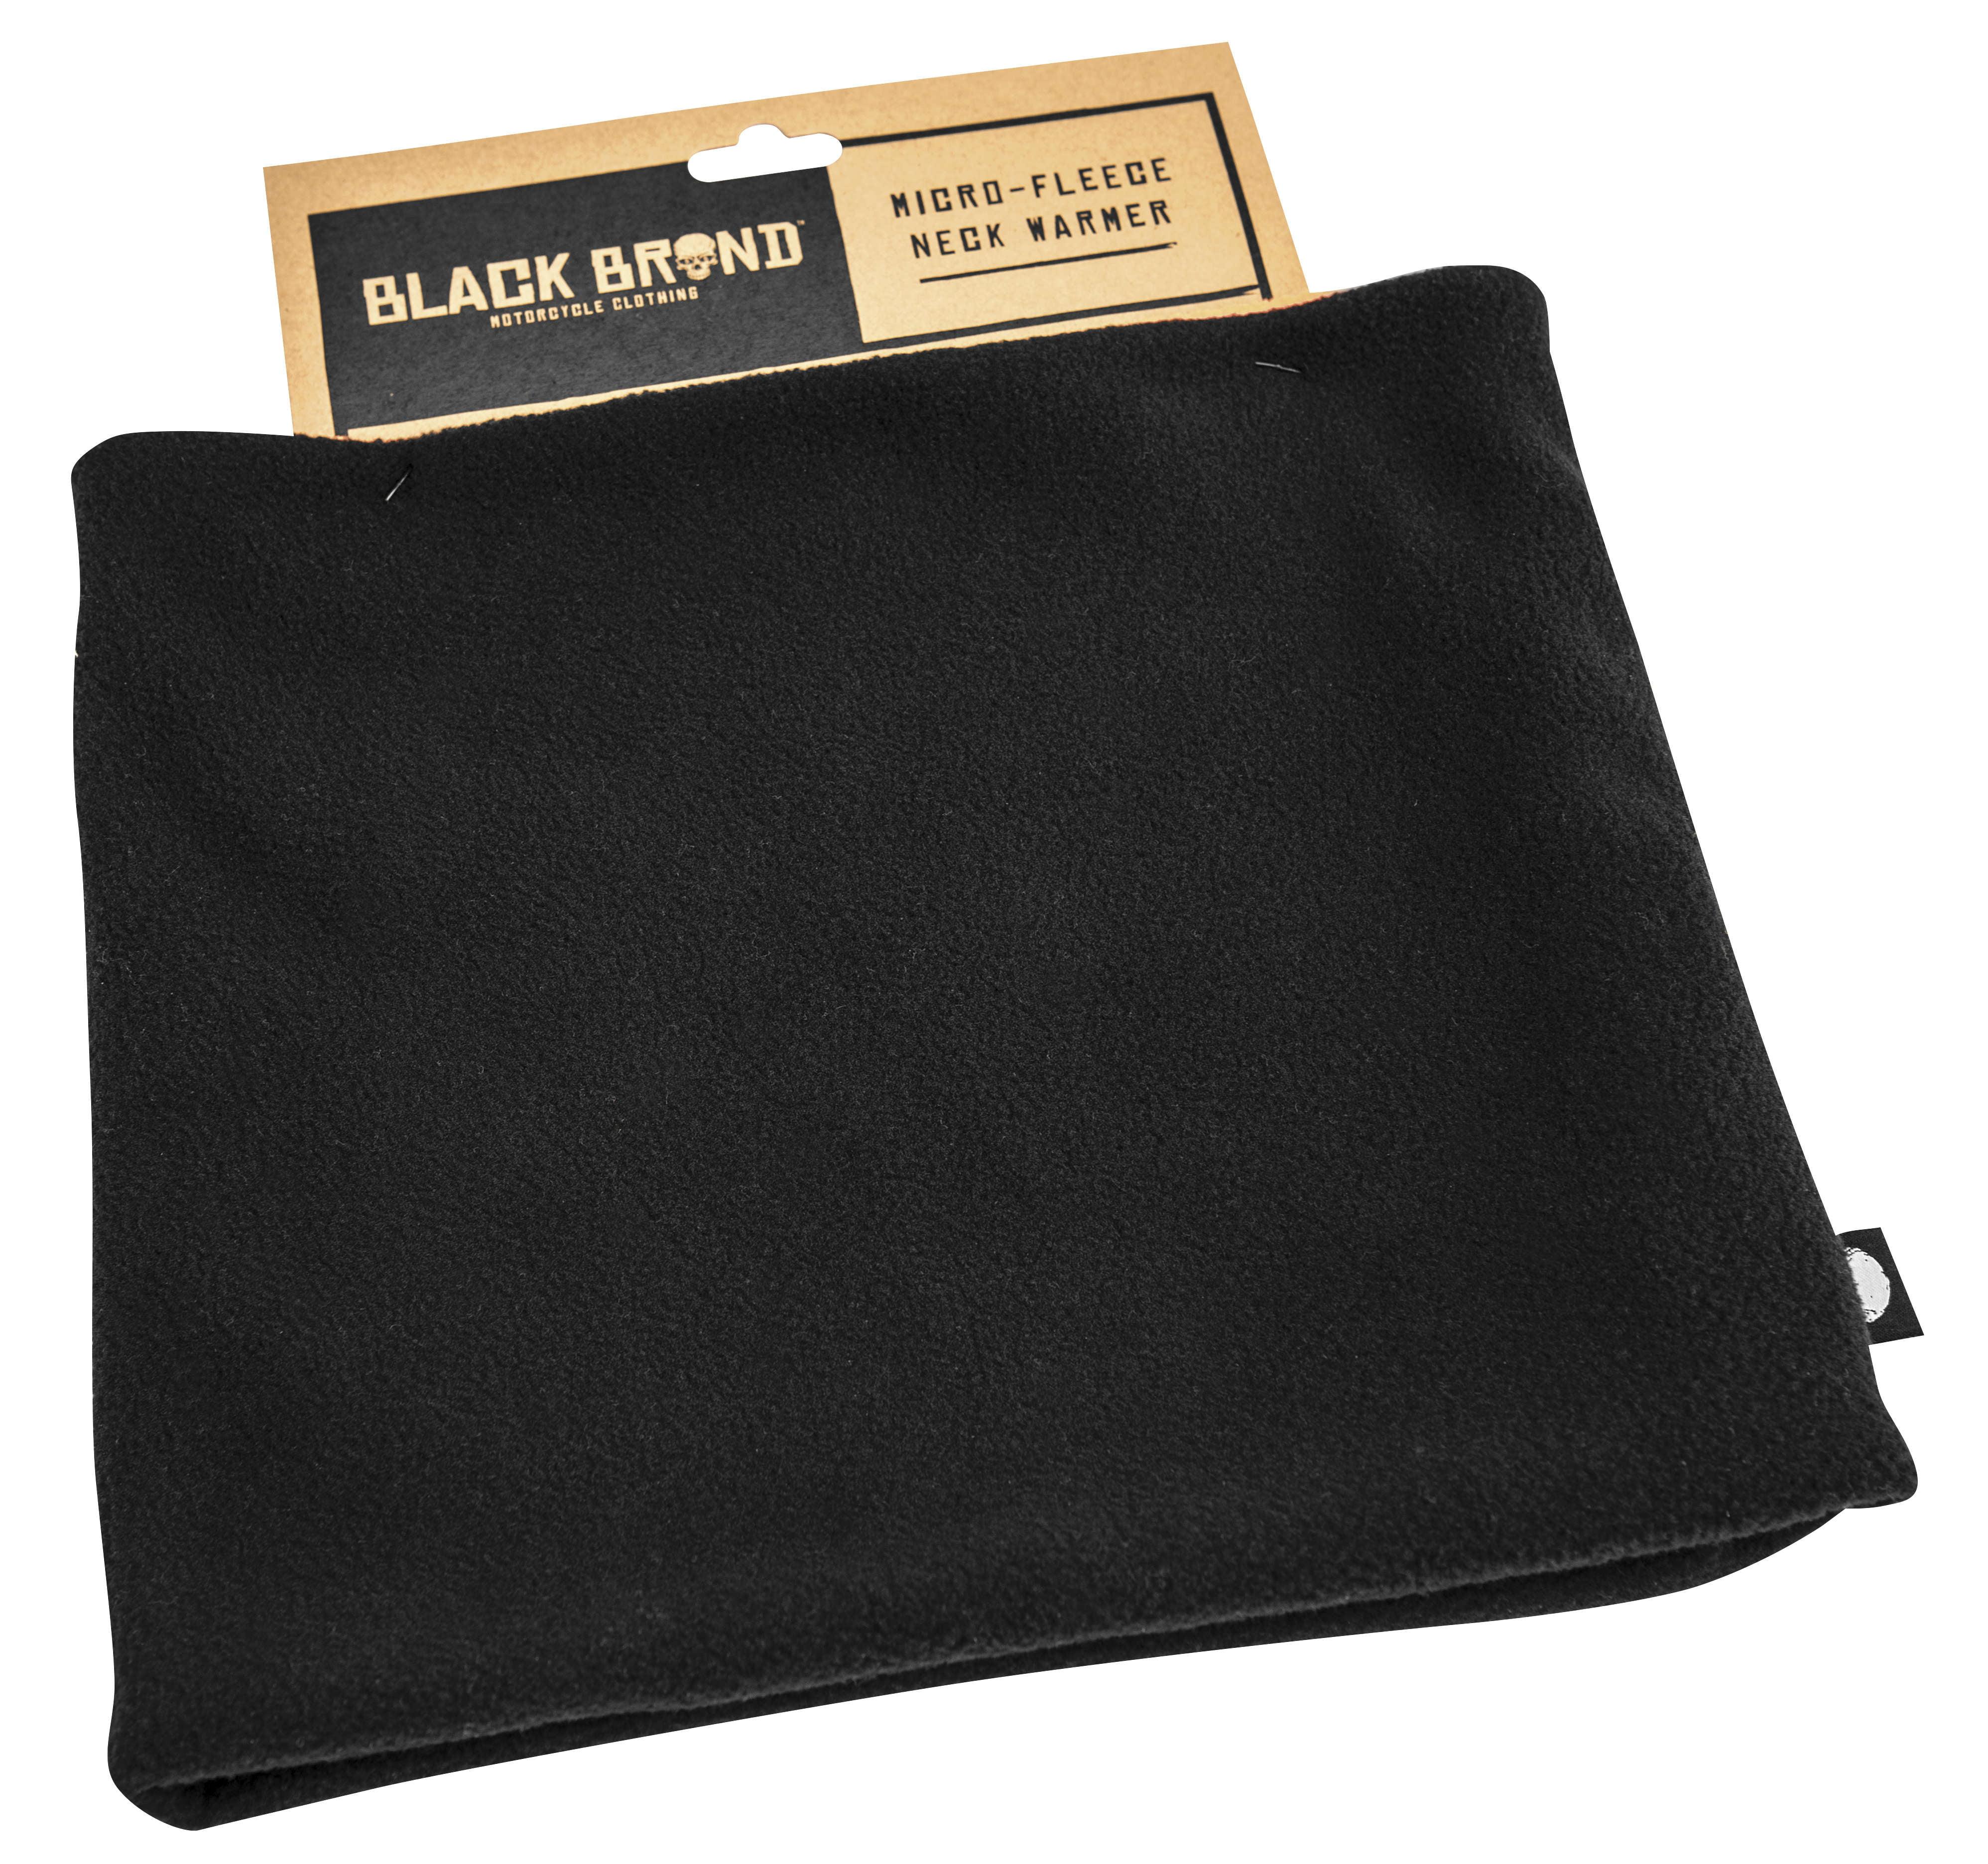 Black Brand Microfleece Neck Warmer (Black, OSFM)